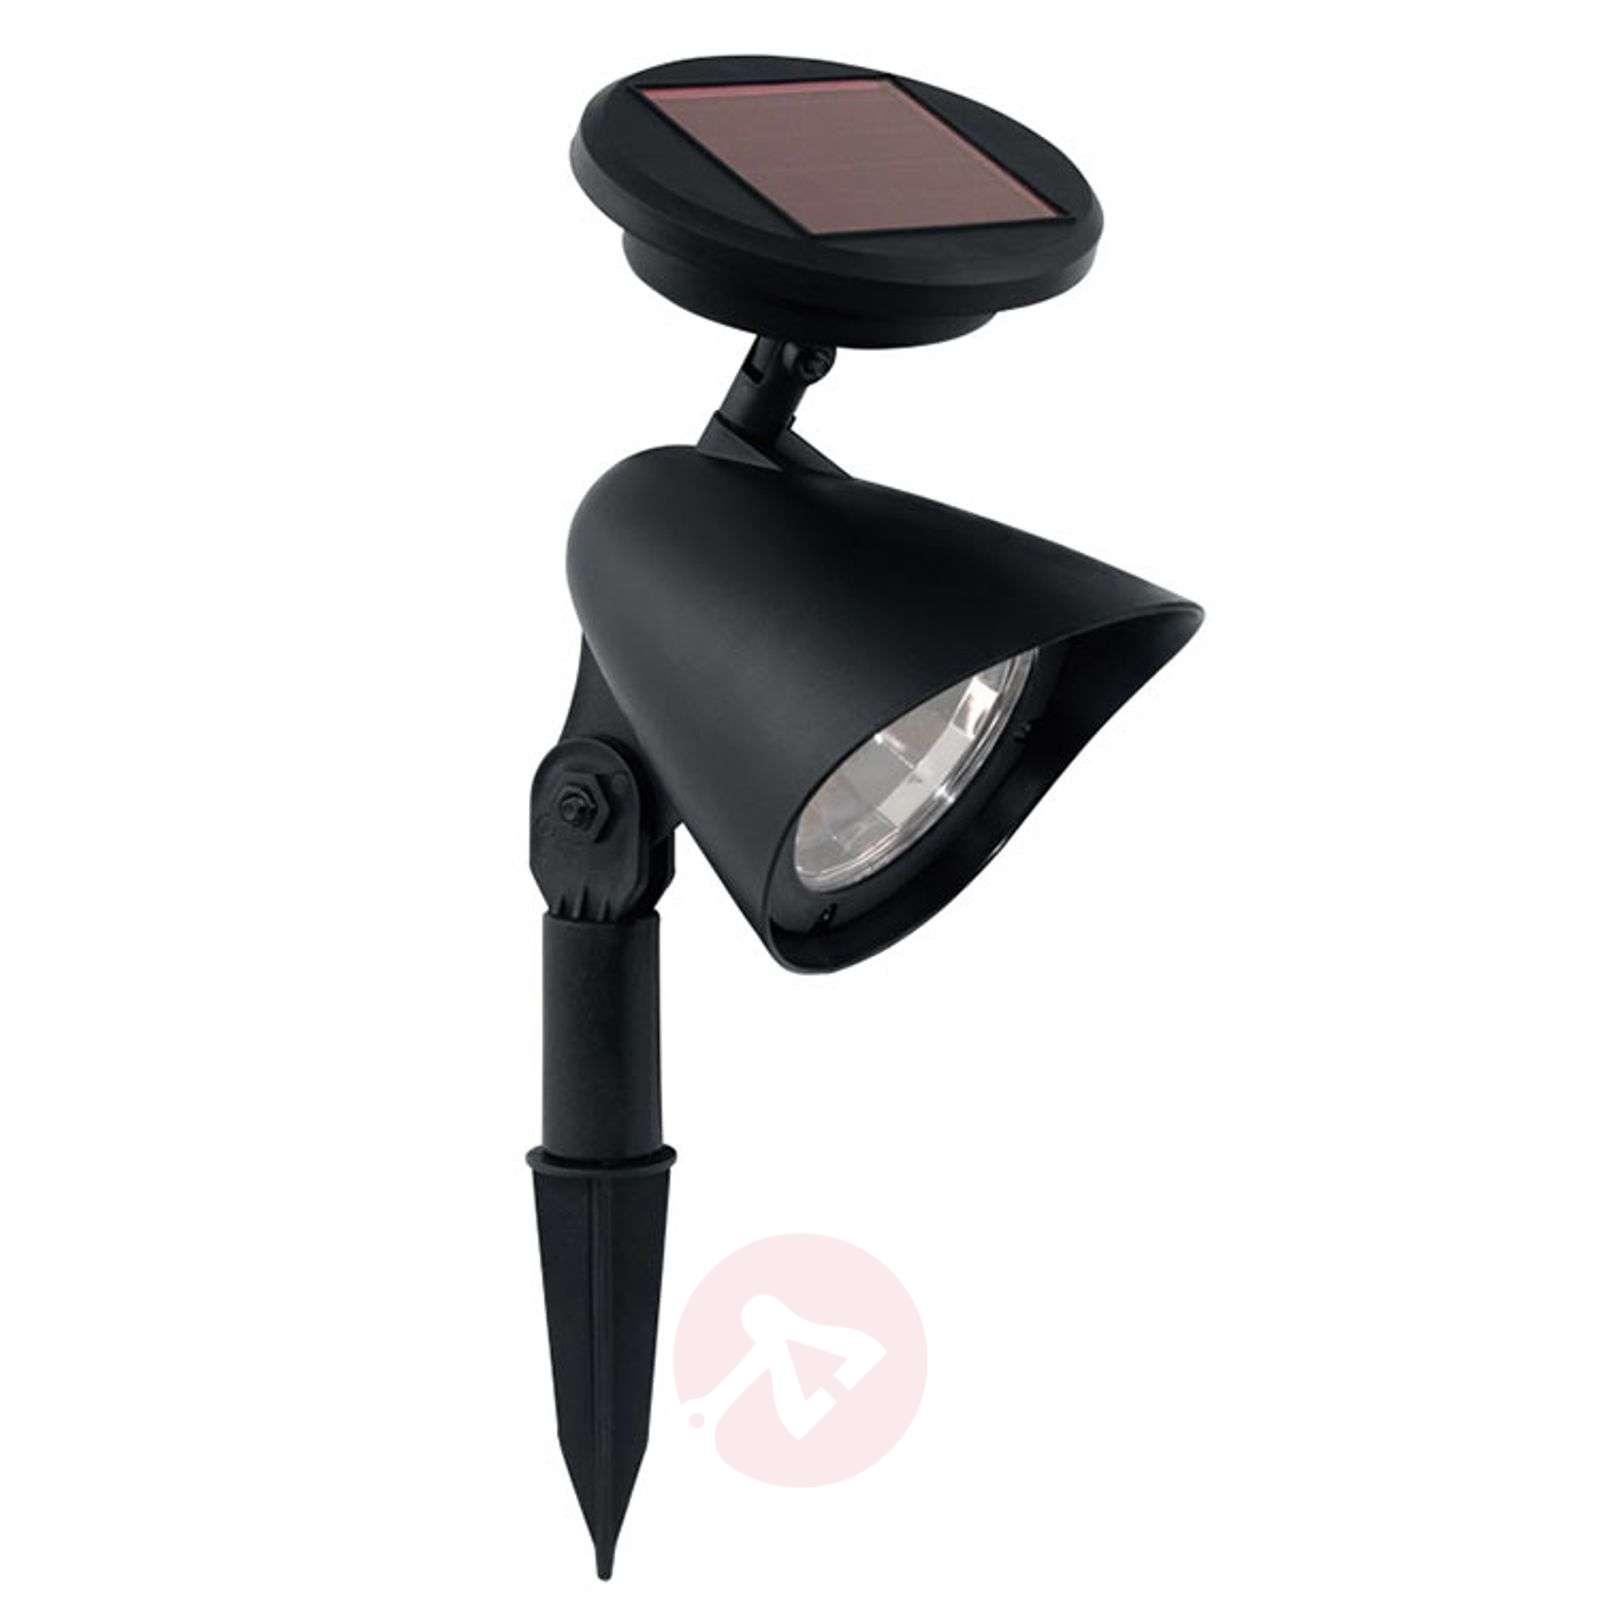 LED solar ground spike light Ludo, black | Lights.ie